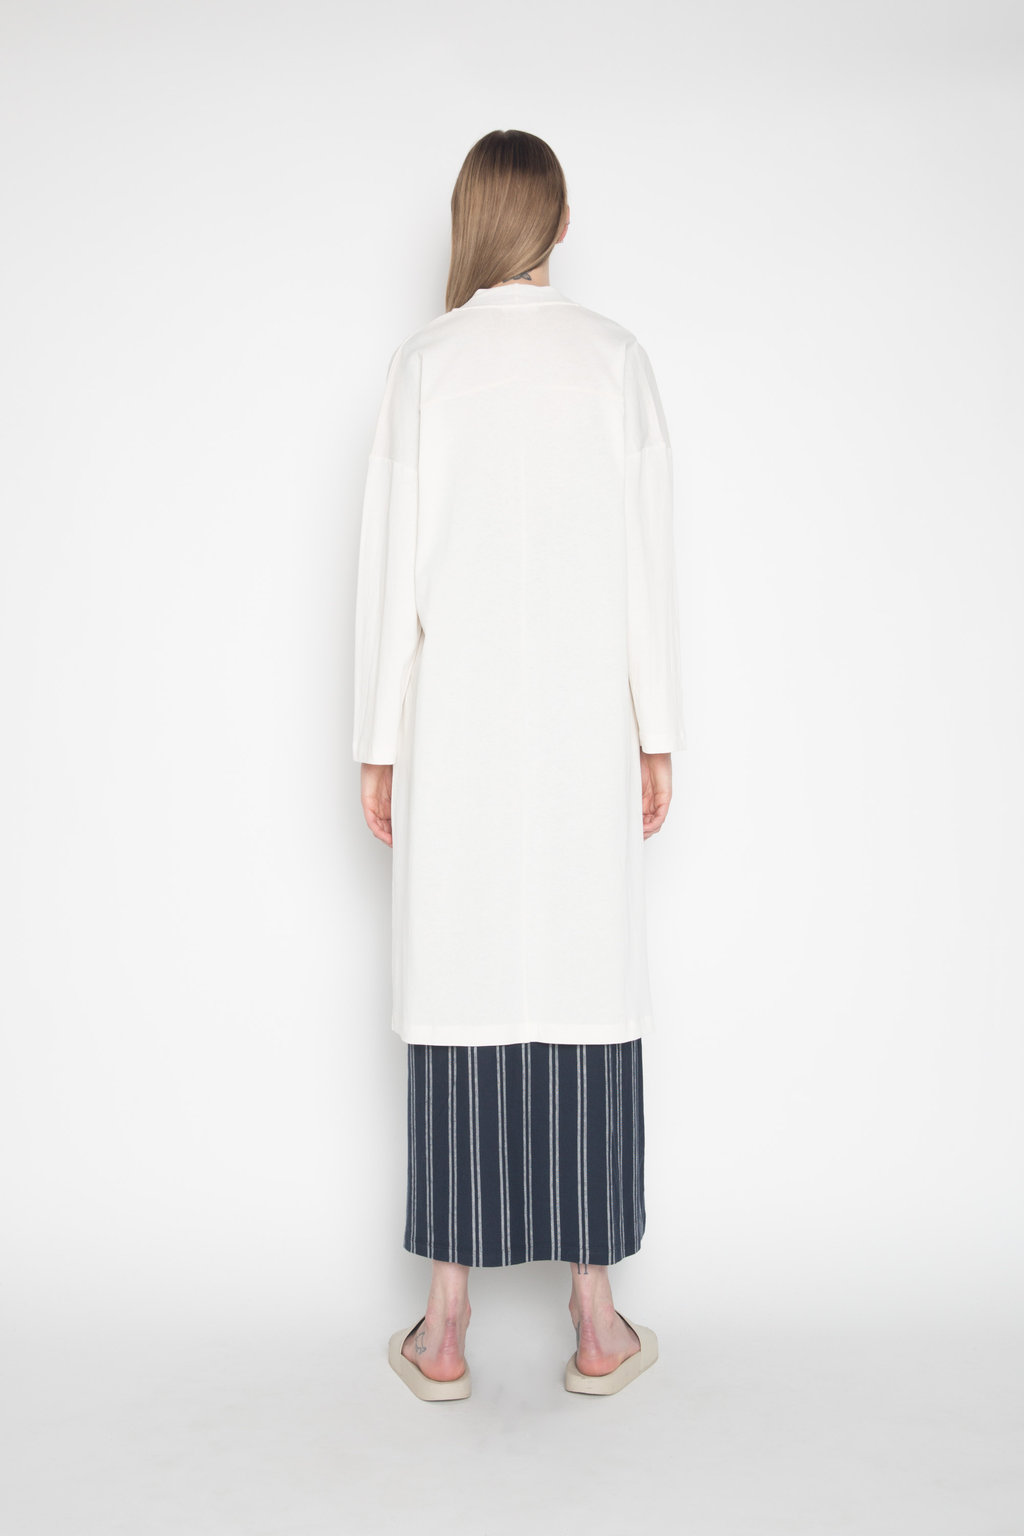 Cardigan 1795 White 4